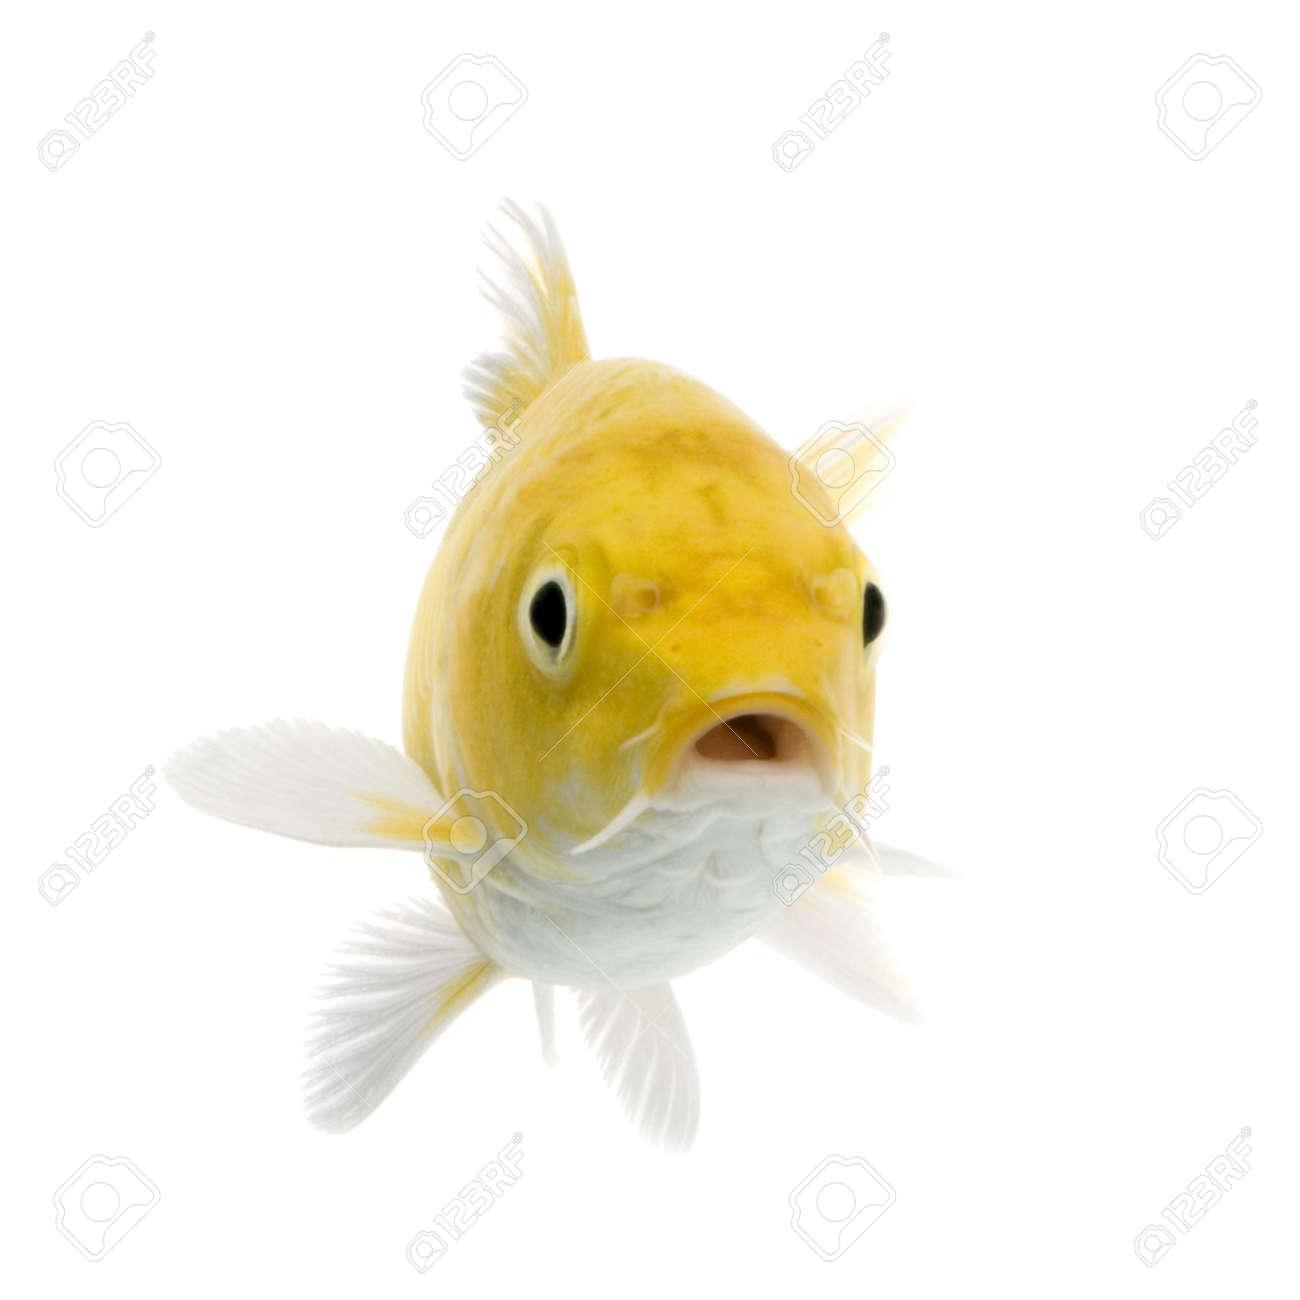 Ko� - YAMABUKI OGON swimming in front of a white background Stock Photo - 872053